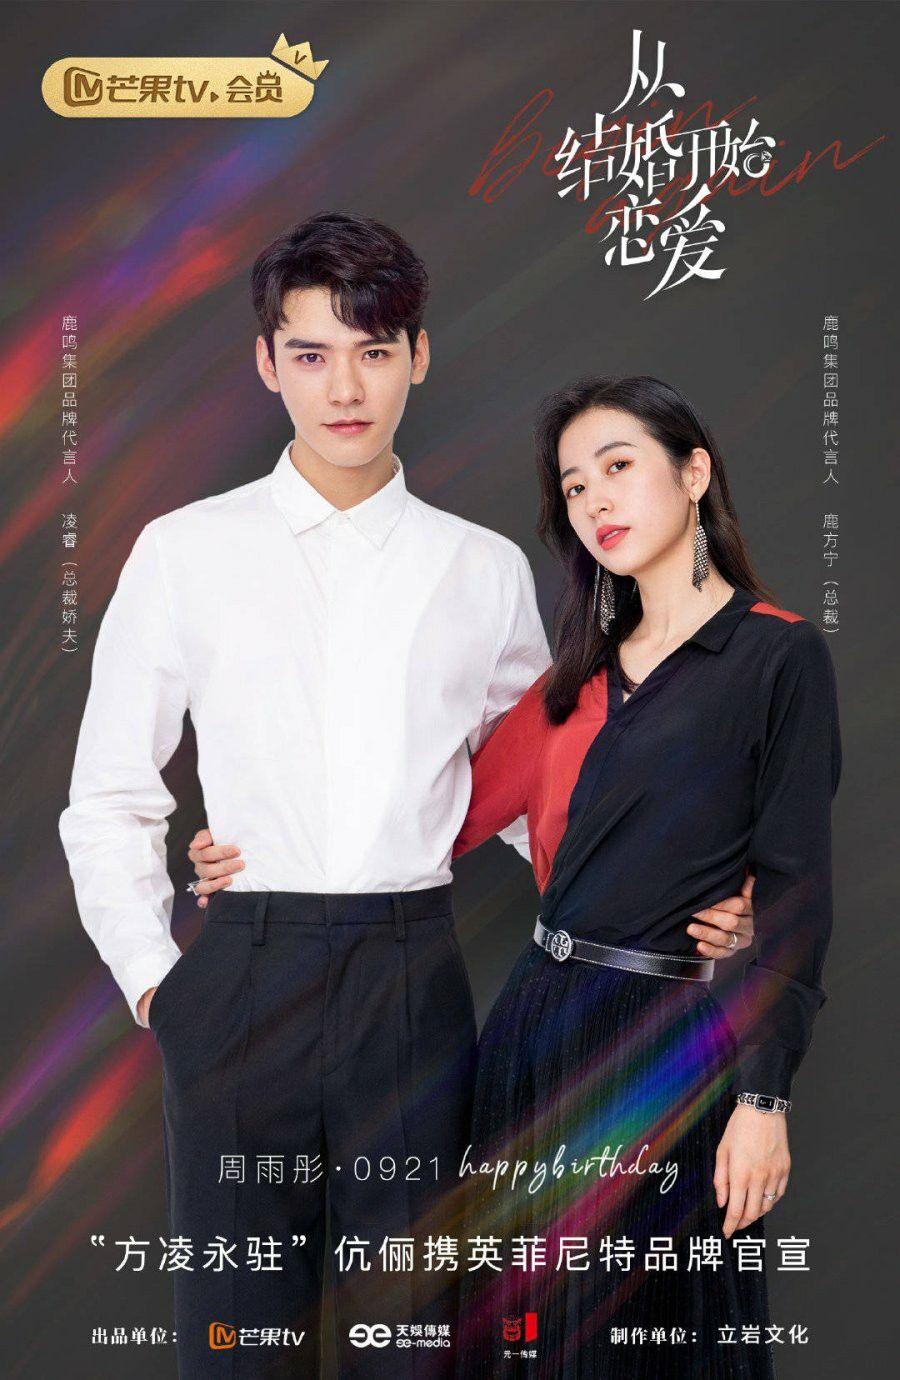 Pin By San San On Begin Again 2020 Begin Again Drama Fake Relationship